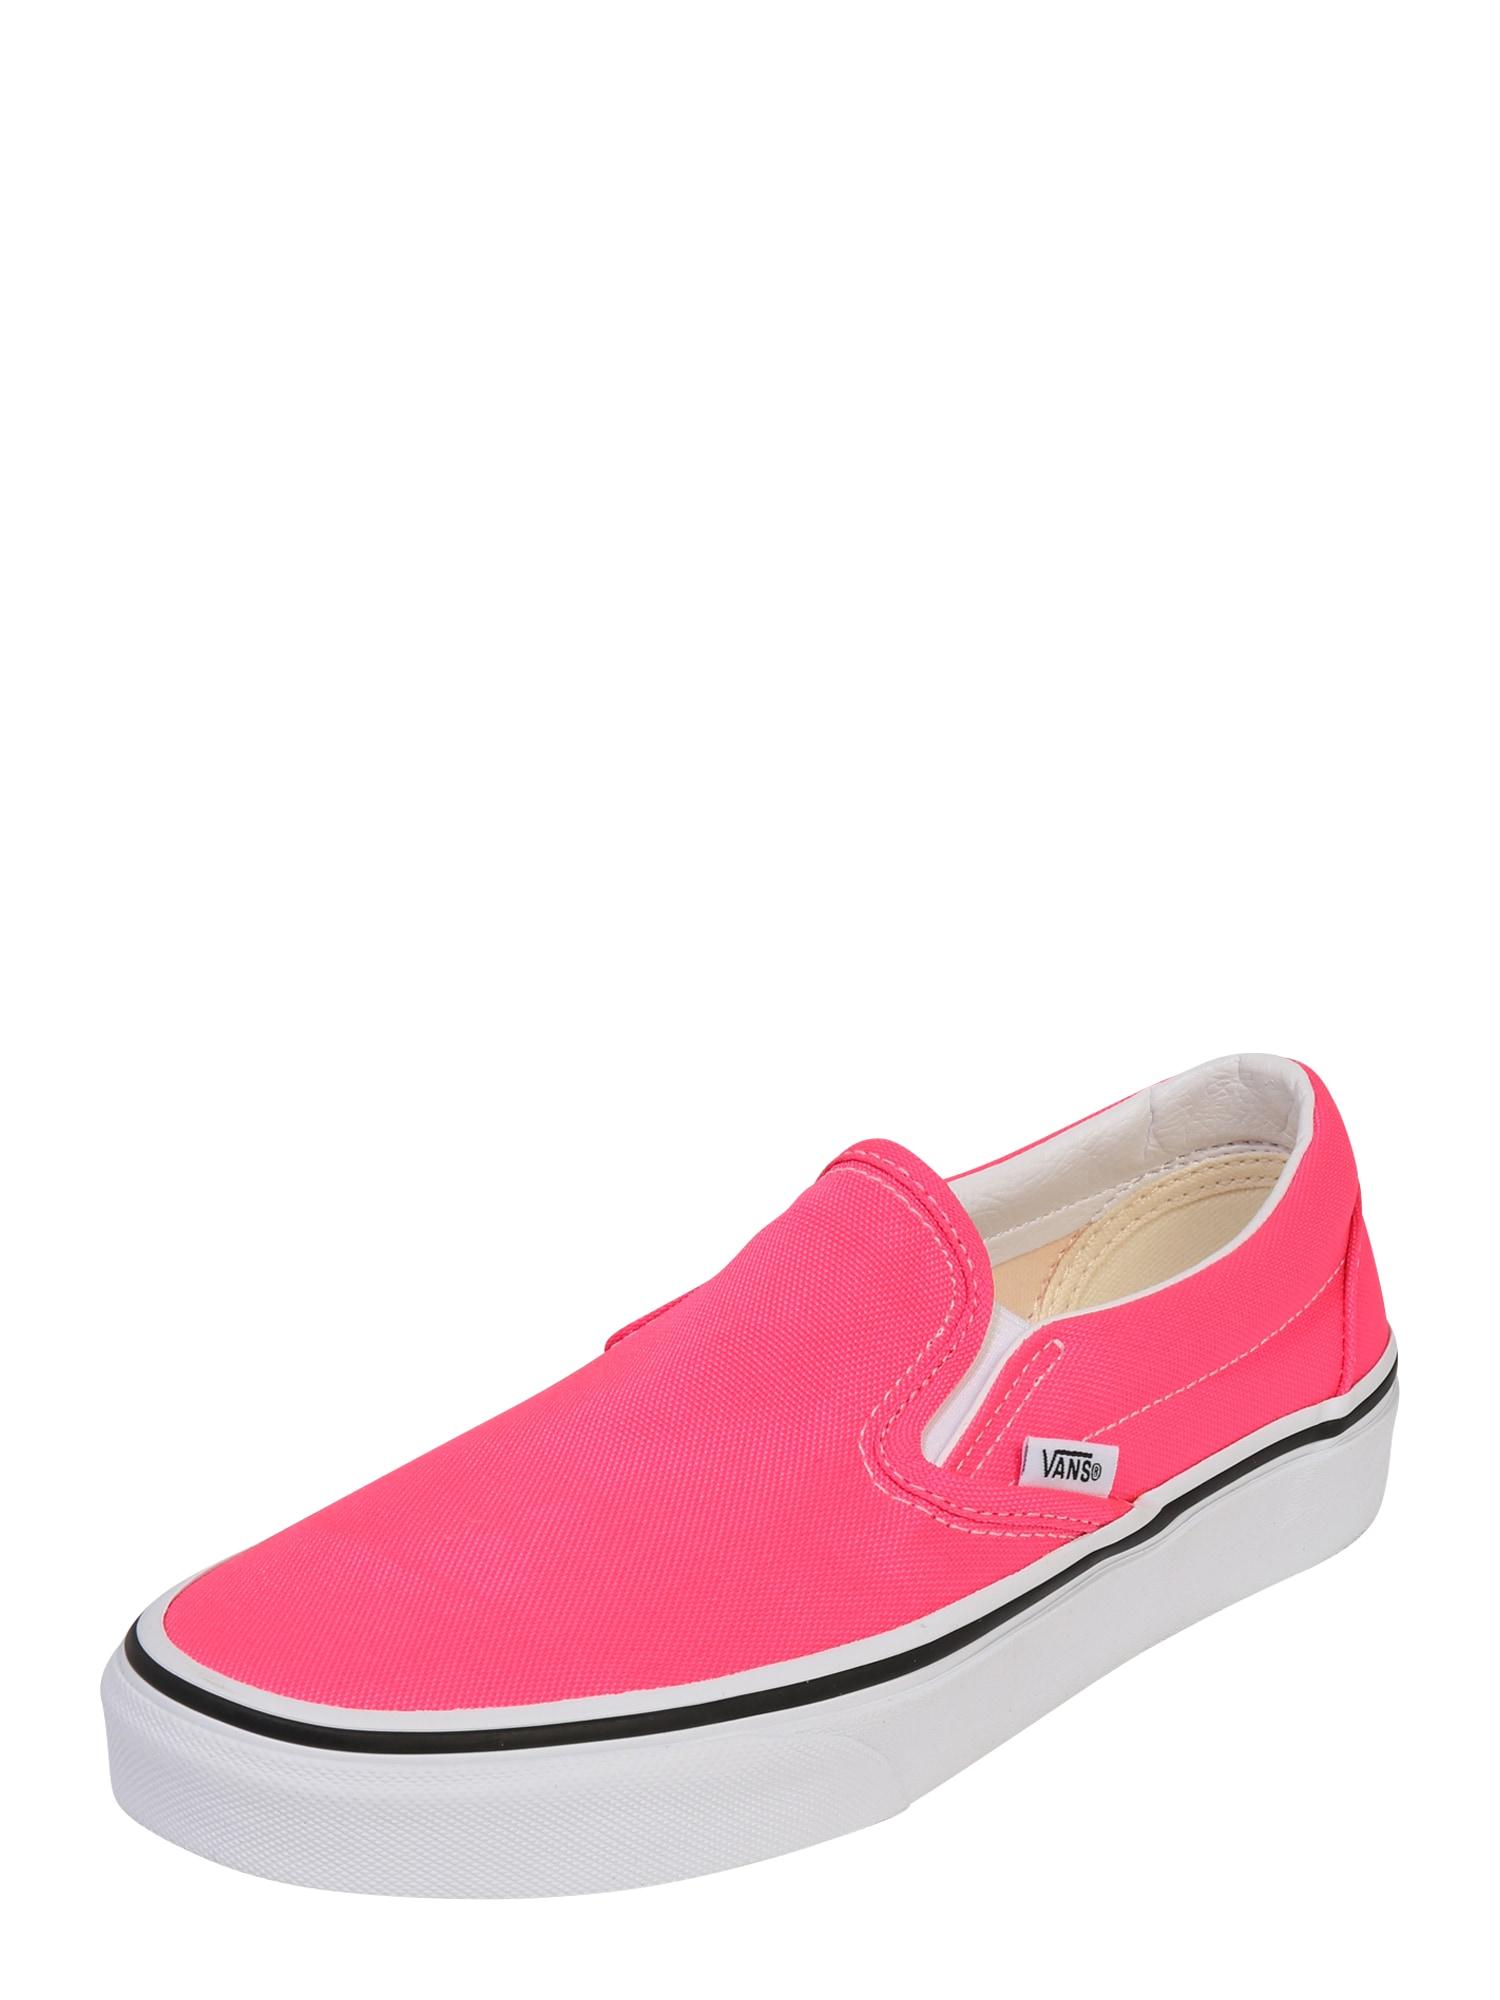 VANS Slip on boty  pink / bílá